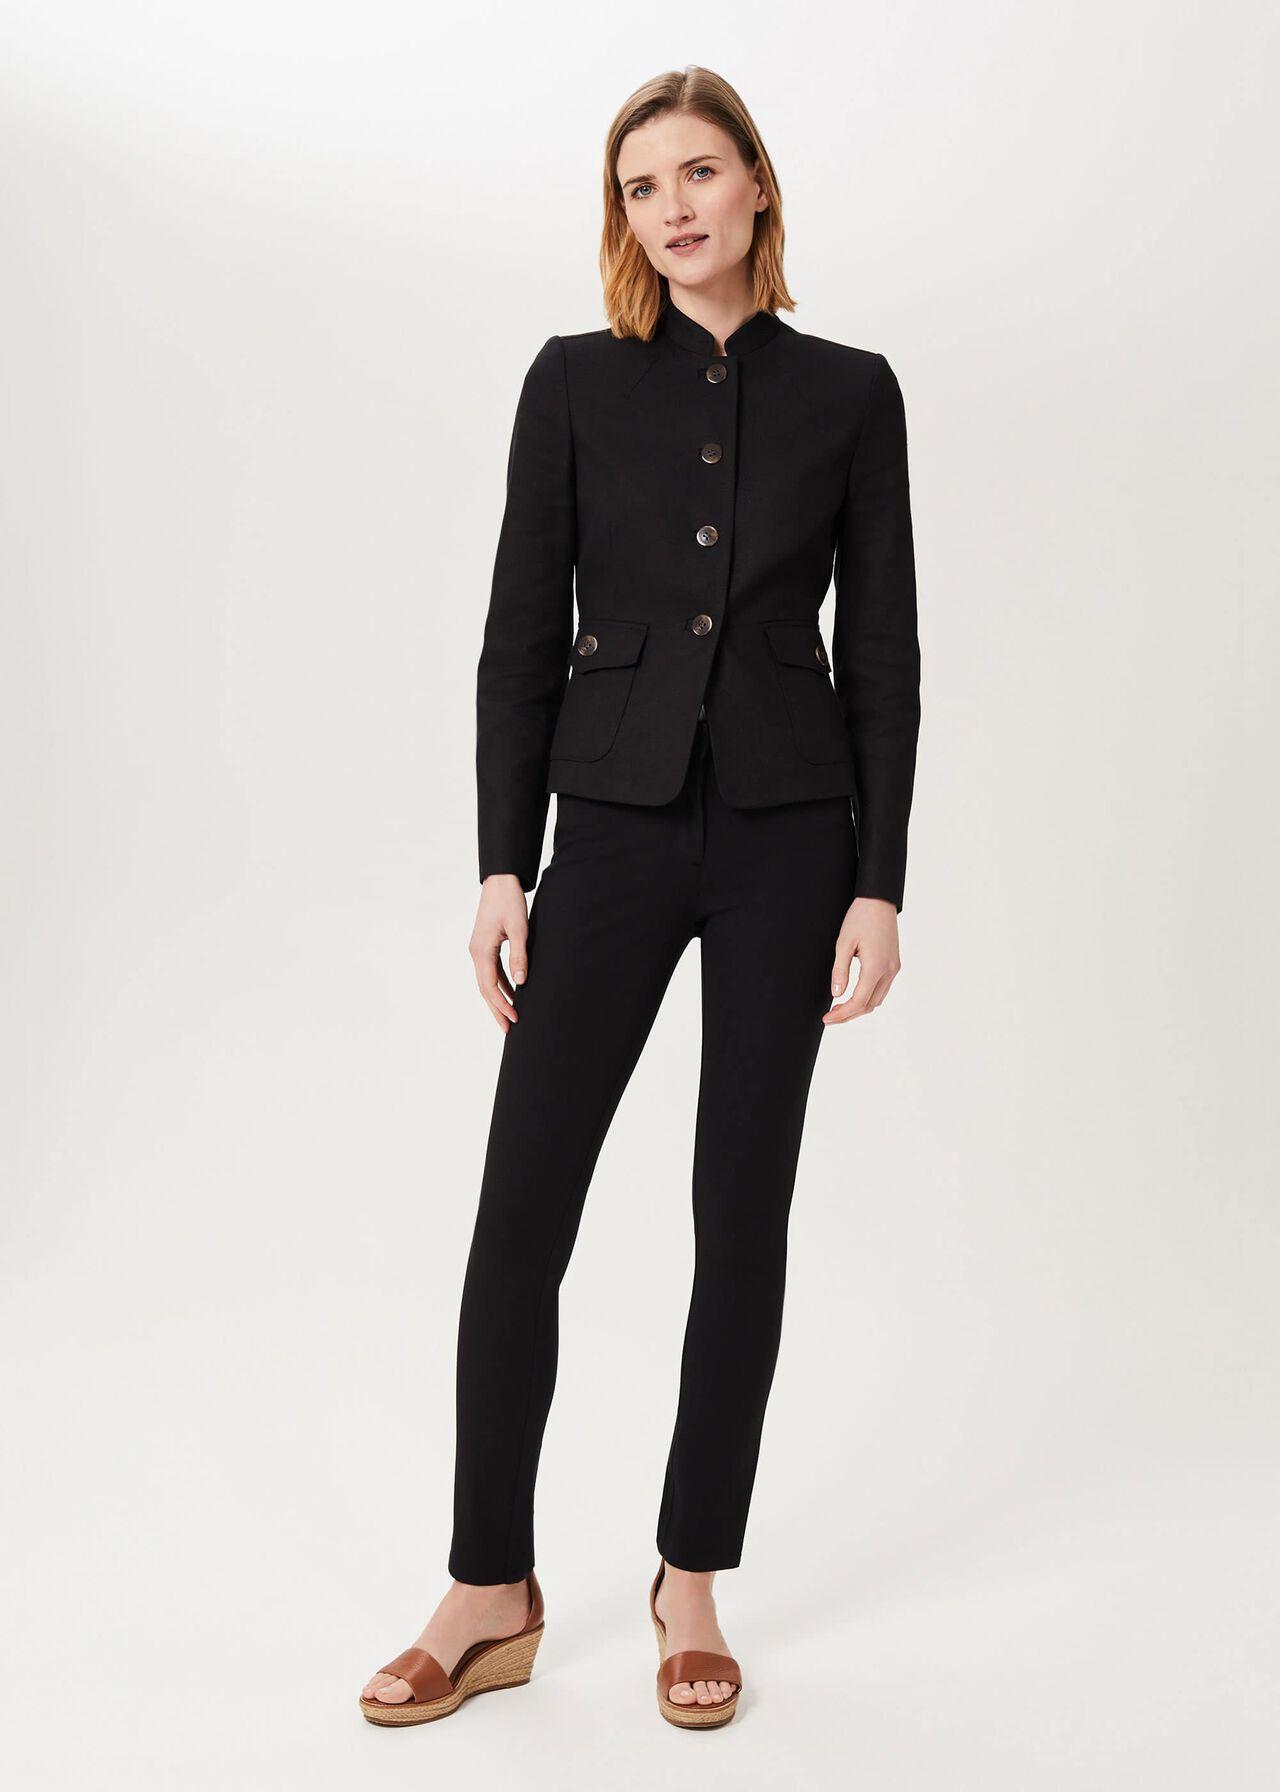 Mindy Linen Blend Jacket, Black, hi-res